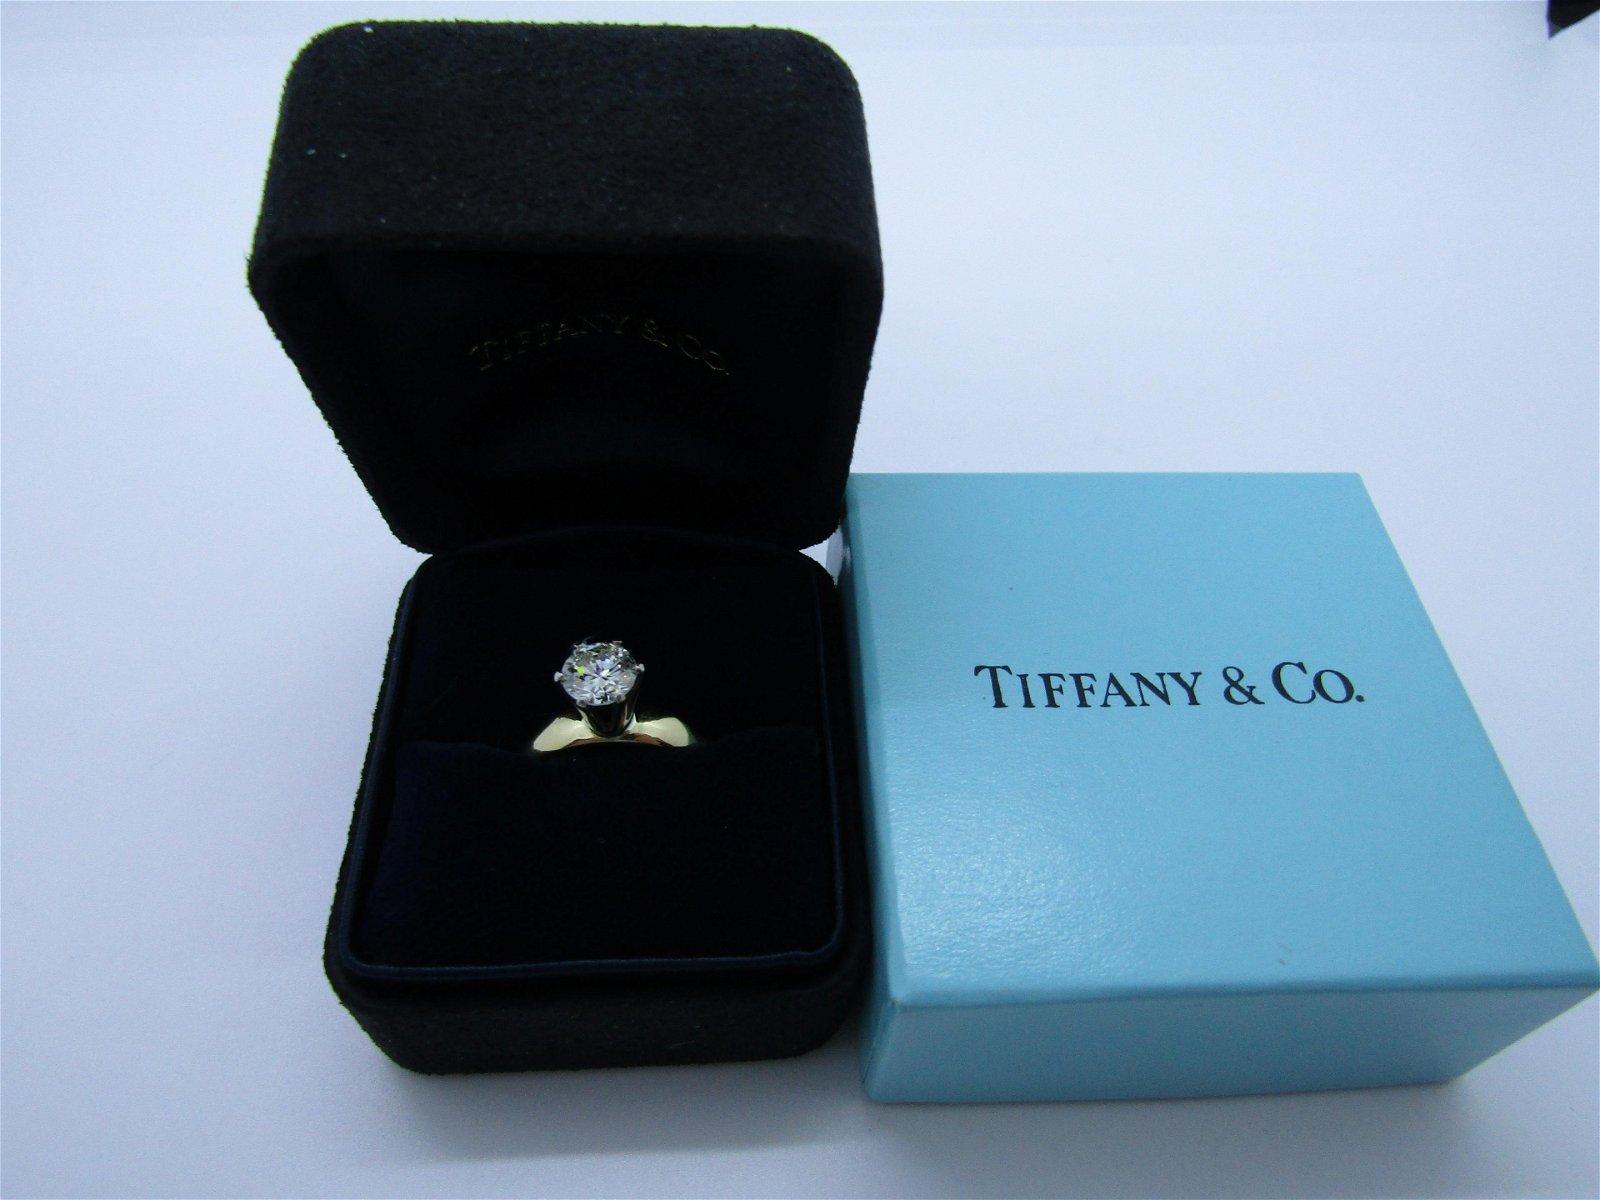 TIFFANY & CO .93CT VS DIAMOND RING 18K GOLD